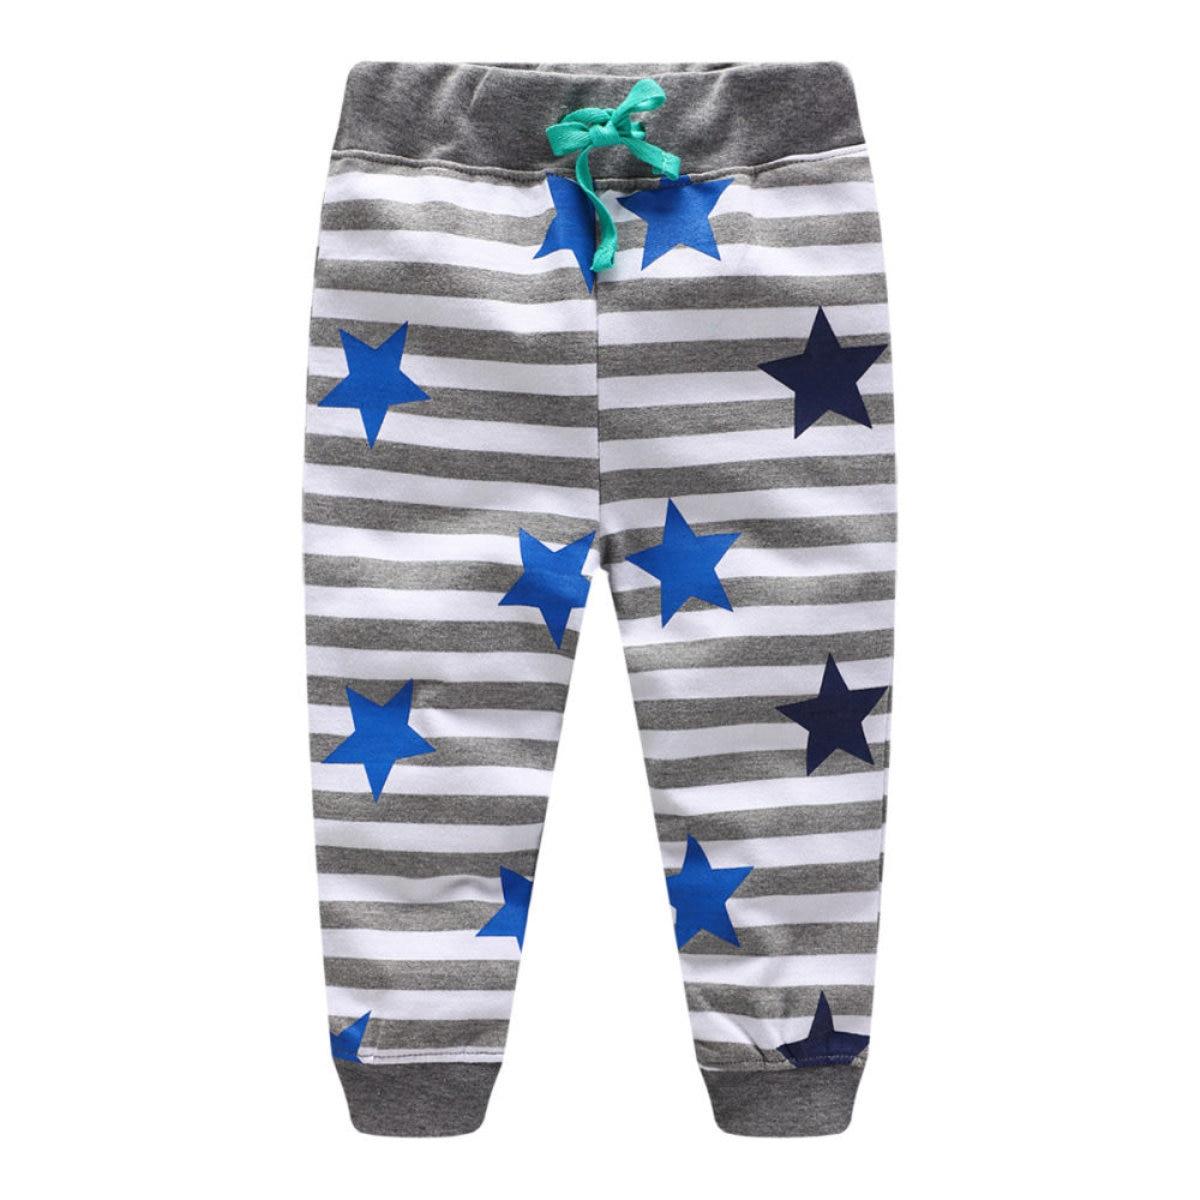 Littlemandy Star Stripe Boys Cotton Pants Children Trousers Brand Print Autumn Winter Baby Clothes Sweaterpants Kids Leggings